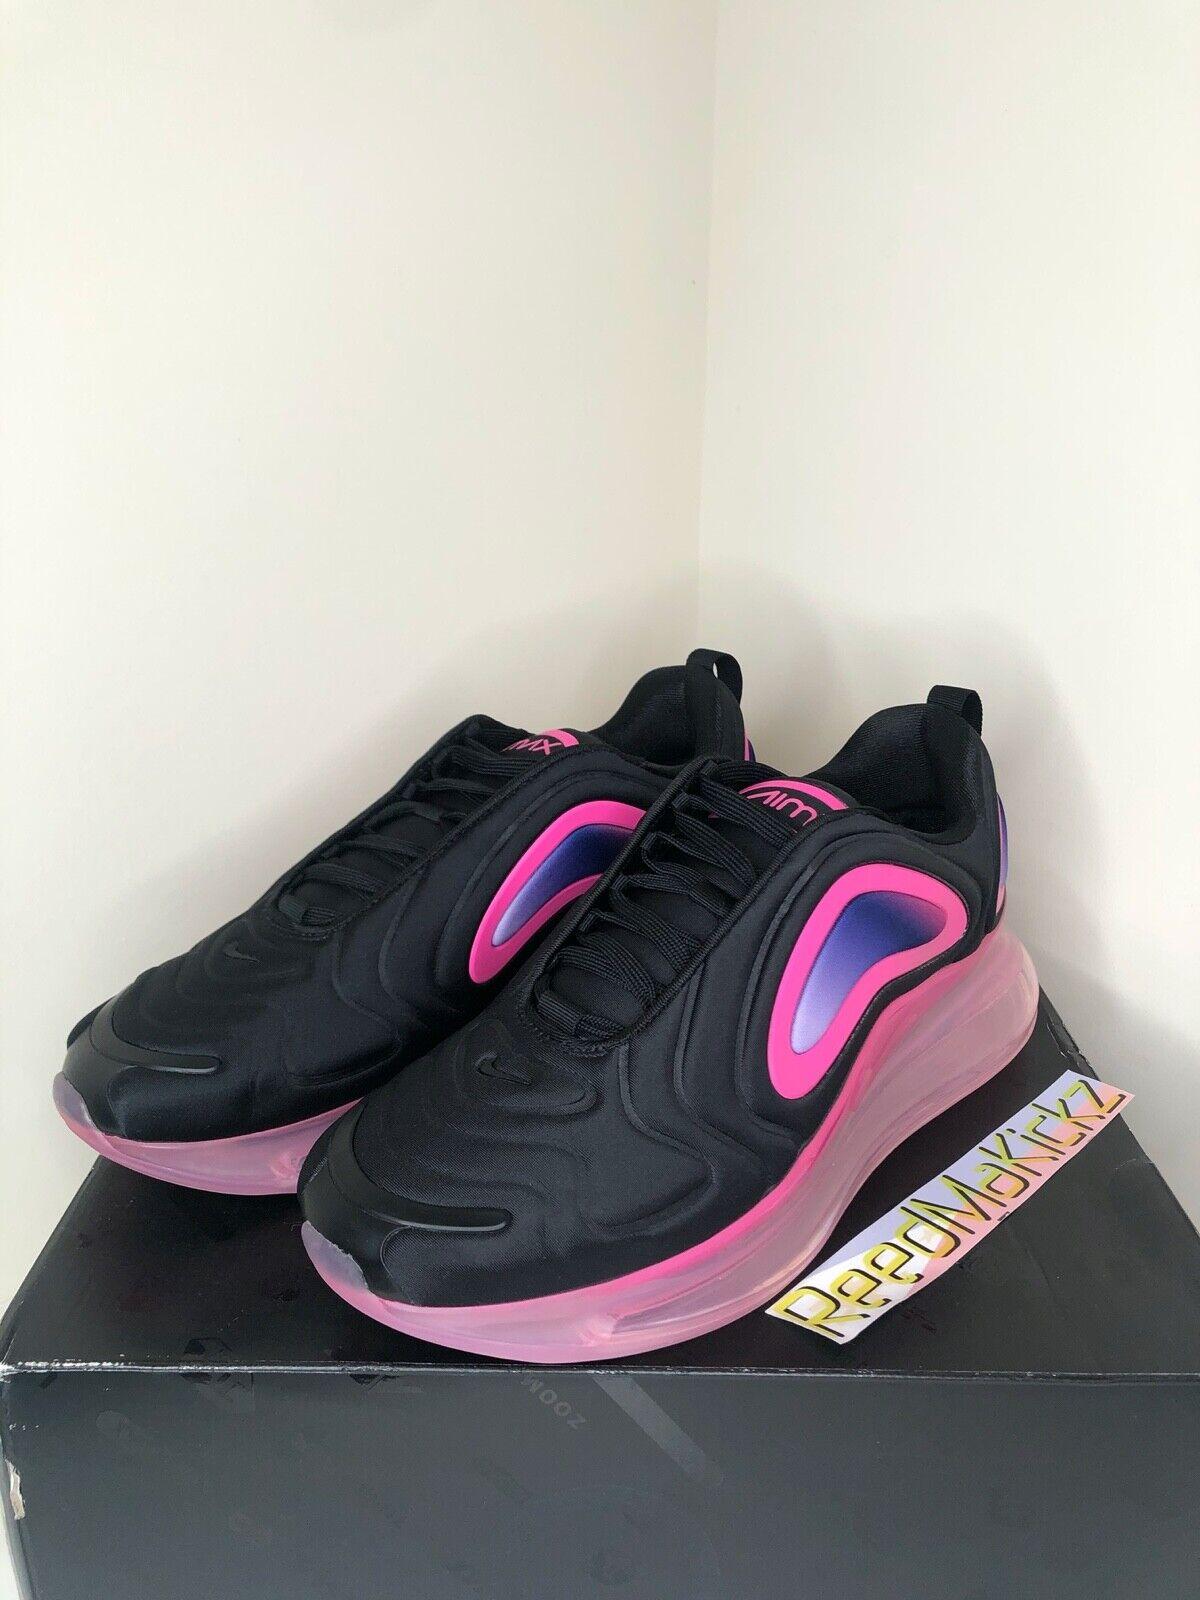 Nike Air Max 720 Black Pink Blast Running Shoes Mens Size 14 Ao2924 005